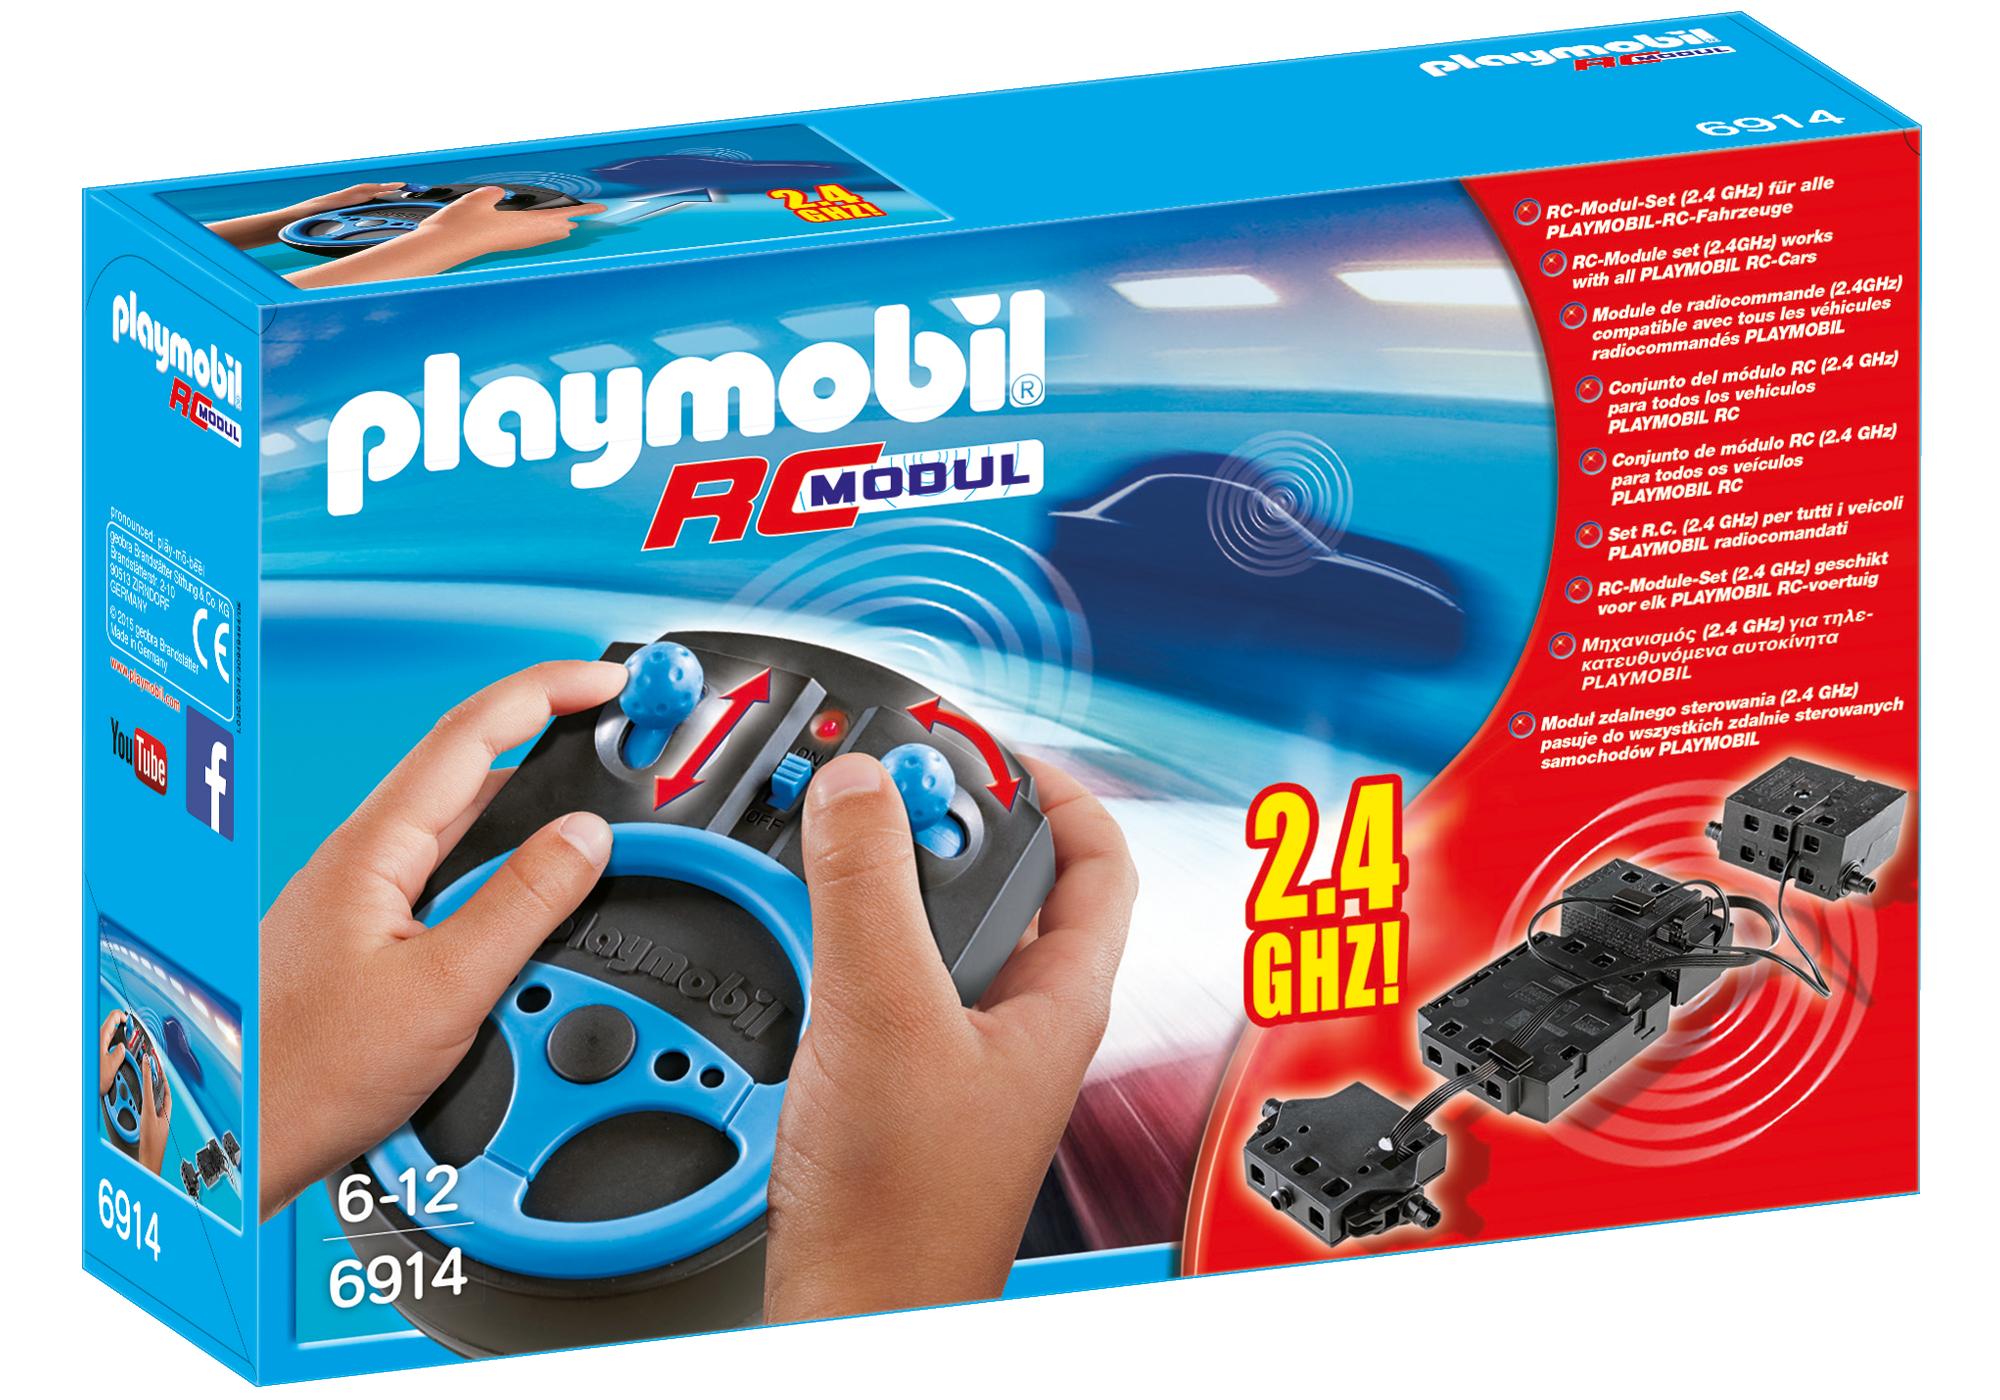 http://media.playmobil.com/i/playmobil/6914_product_box_front/Remote Control Set 2.4GHz